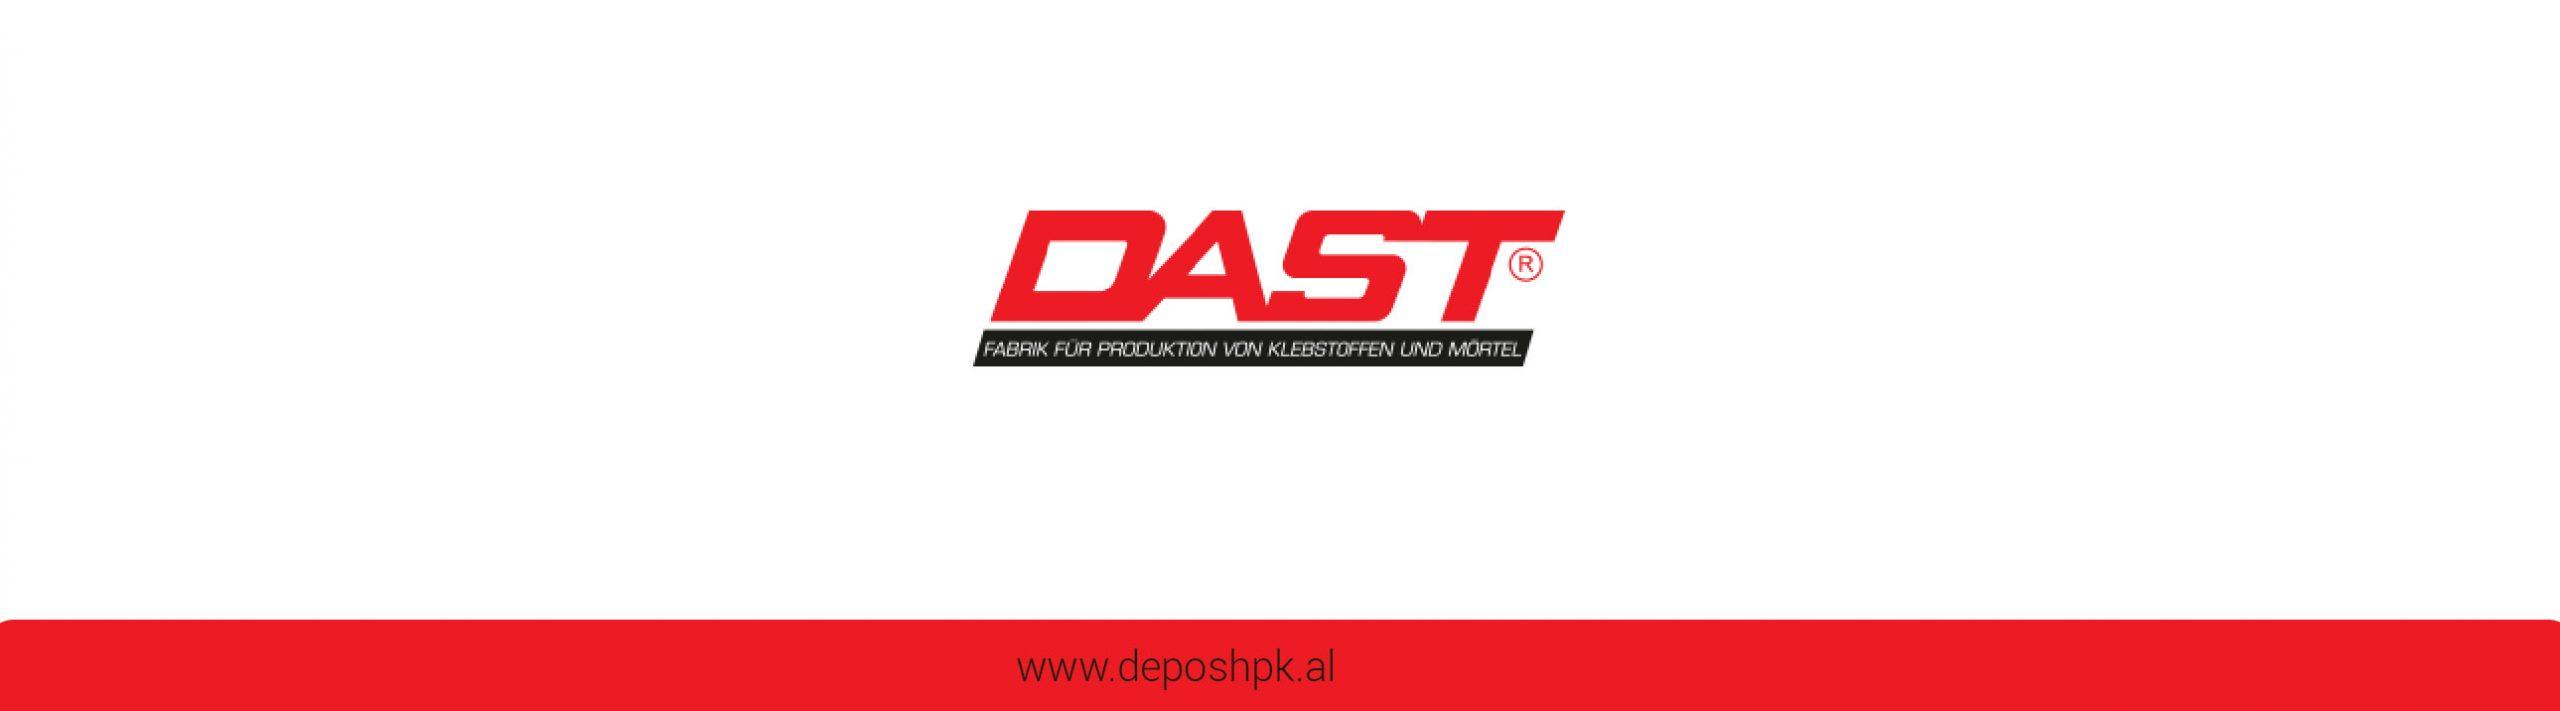 https://www.deposhpk.al/wp-content/uploads/2019/12/dast-produkt-deposhpk.al_-scaled.jpg